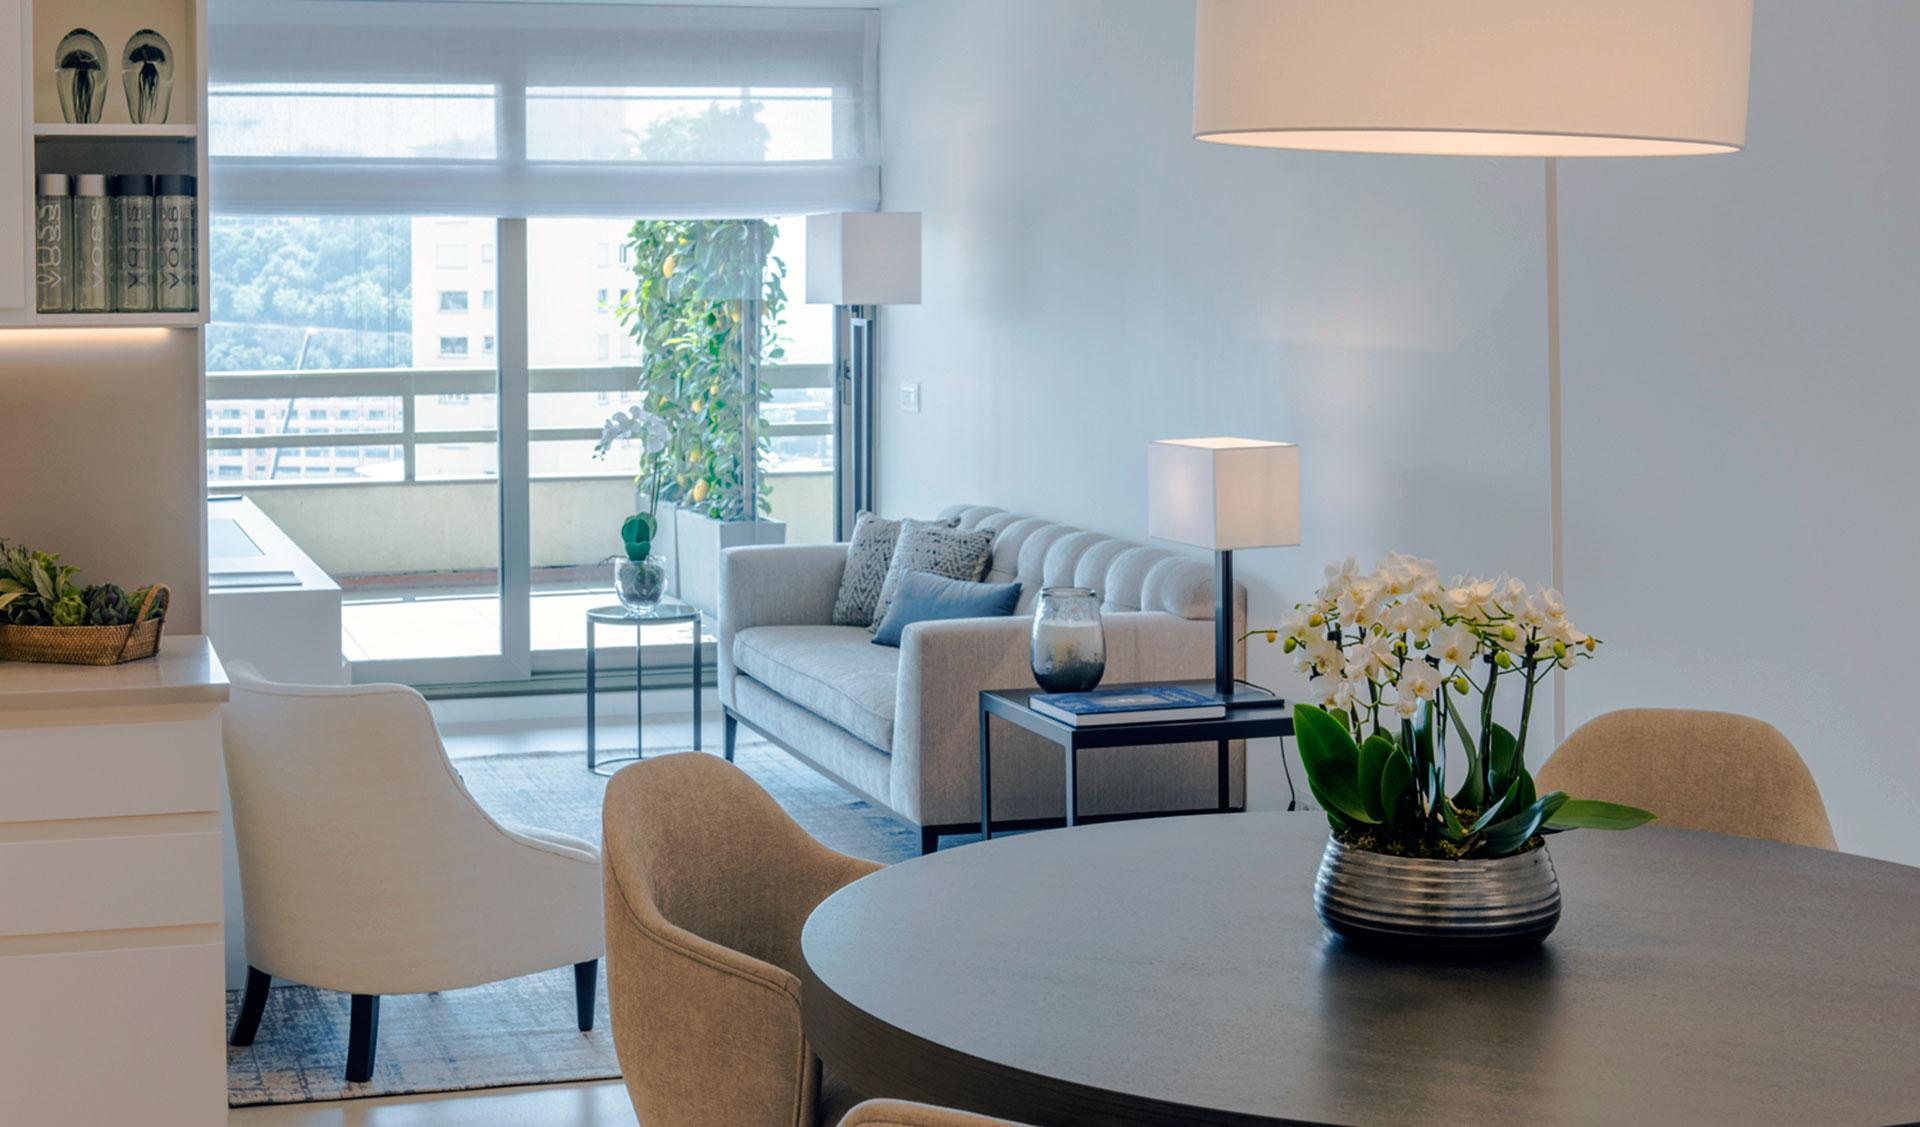 L Architecture D Intérieur architecture and interior design agency - tania architecture